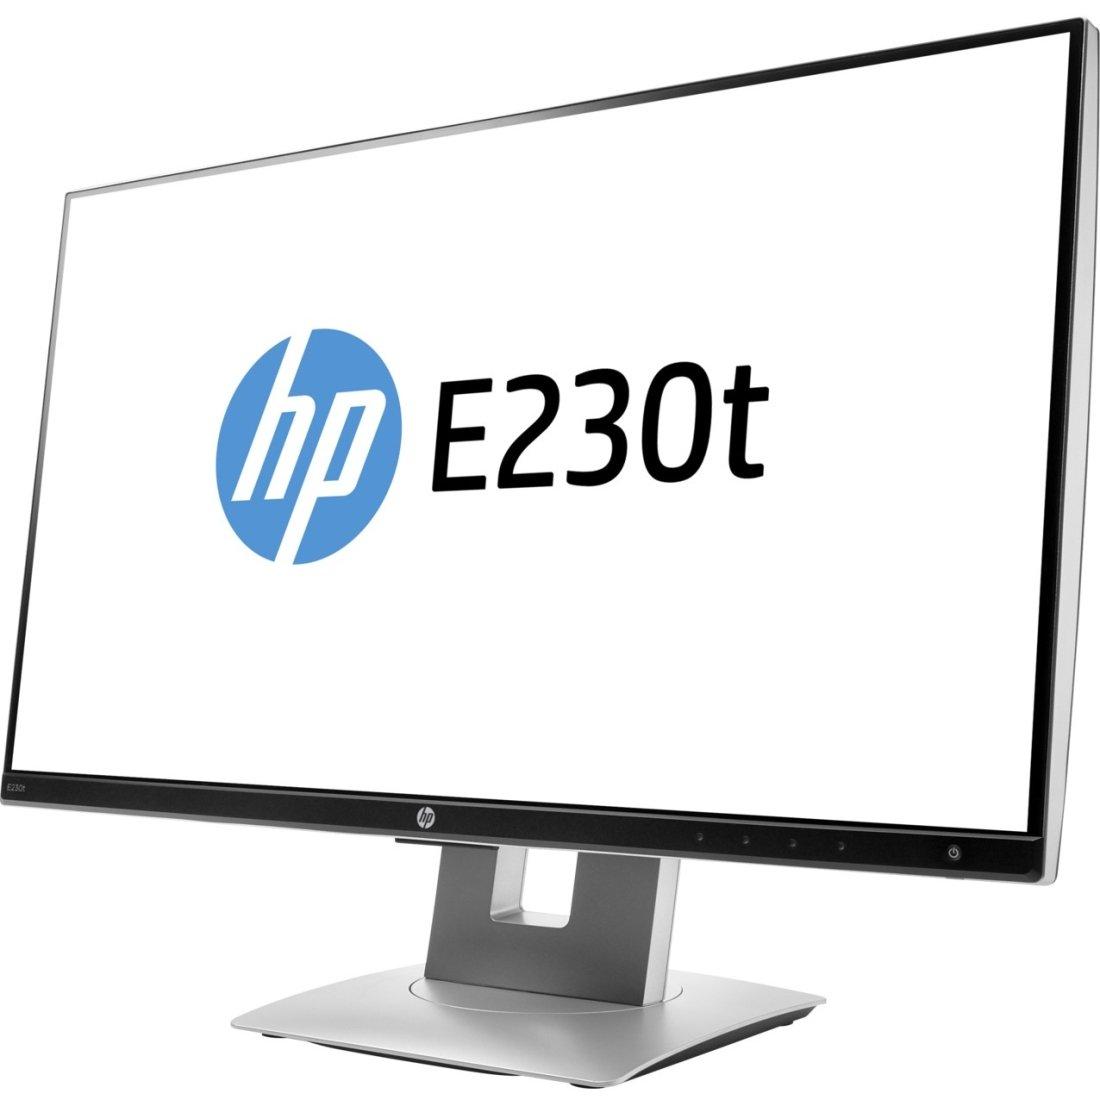 HP Business E230t Touchscreen Monitor